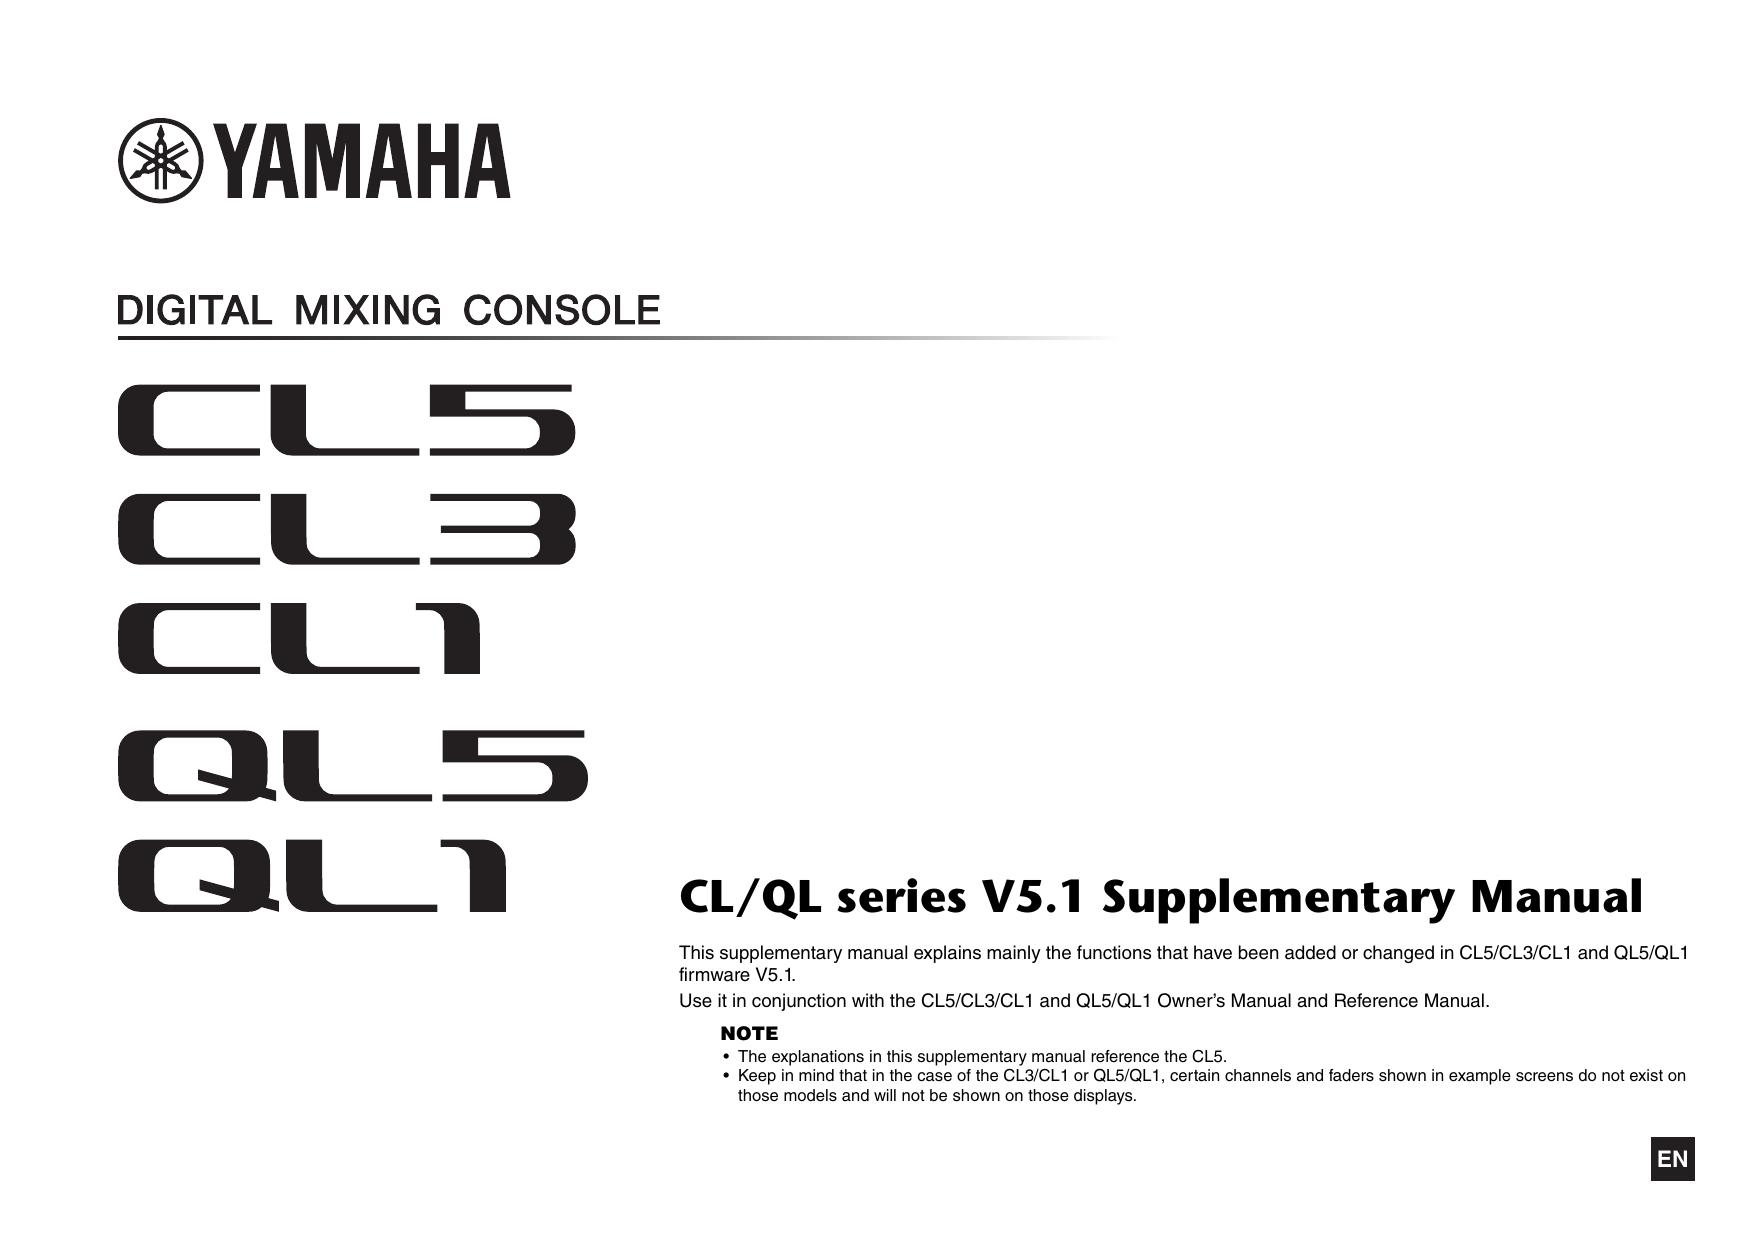 yamaha cl3 manual on